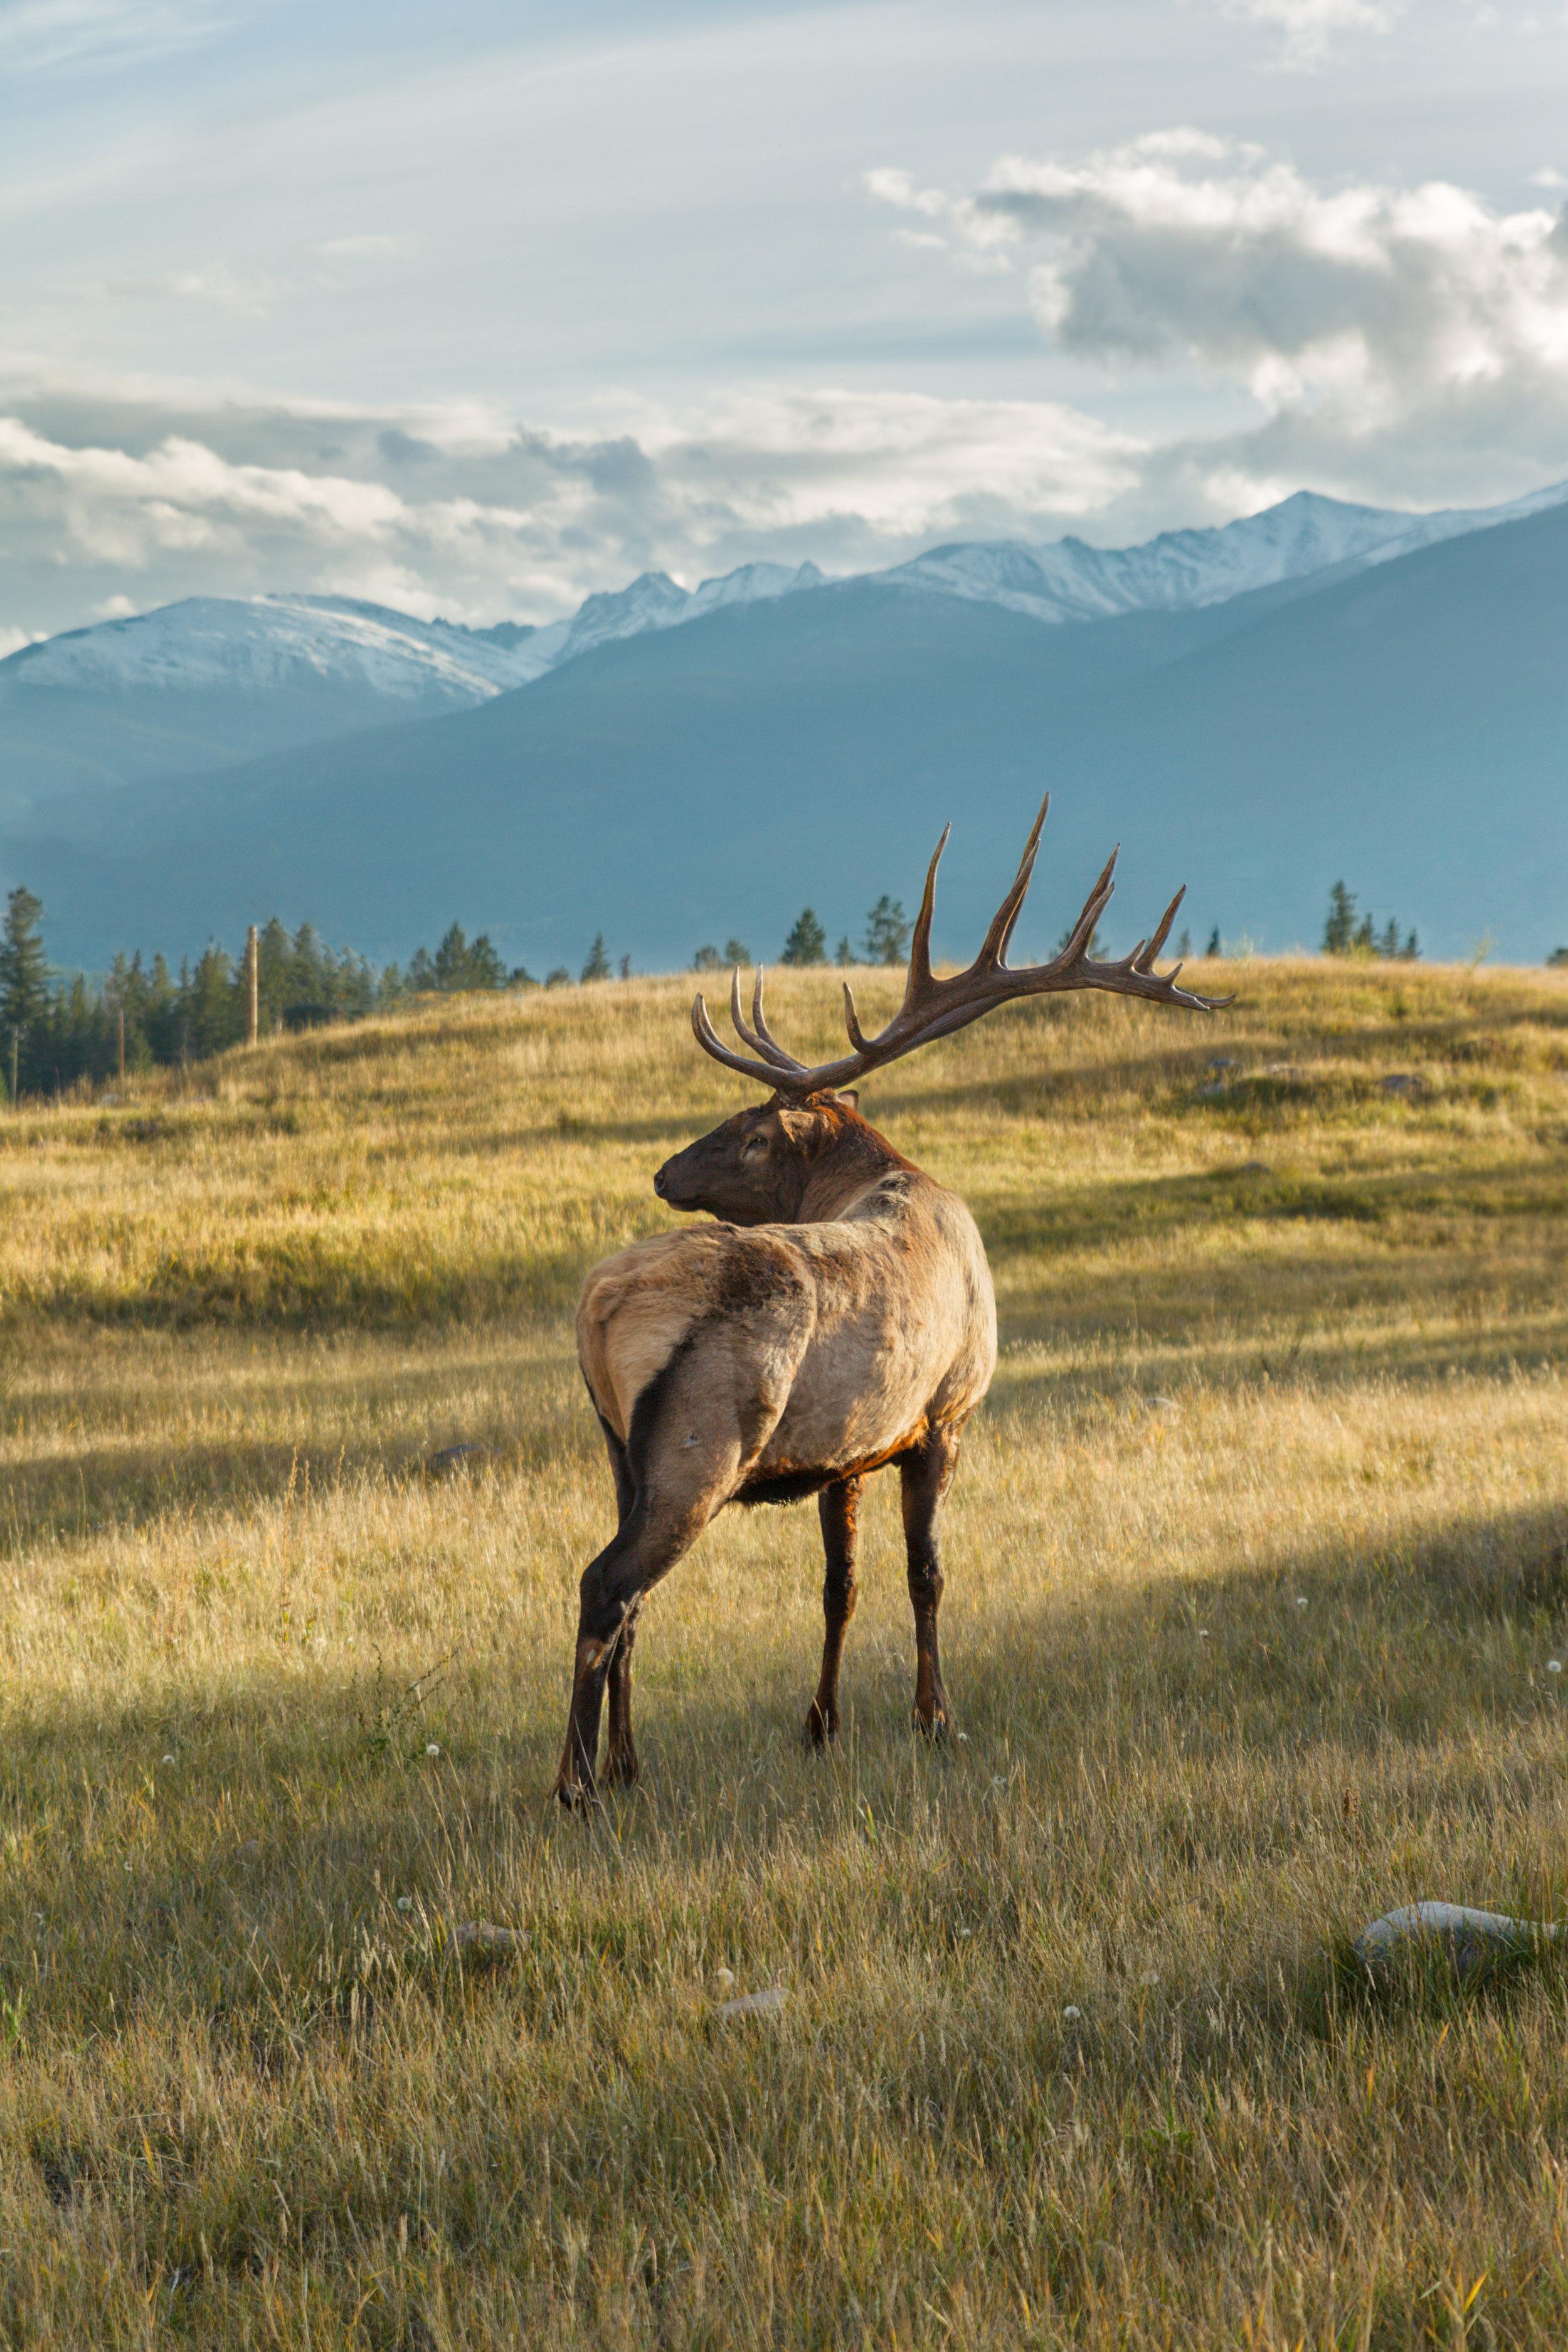 16-Point-Elk-Mountains.jpg